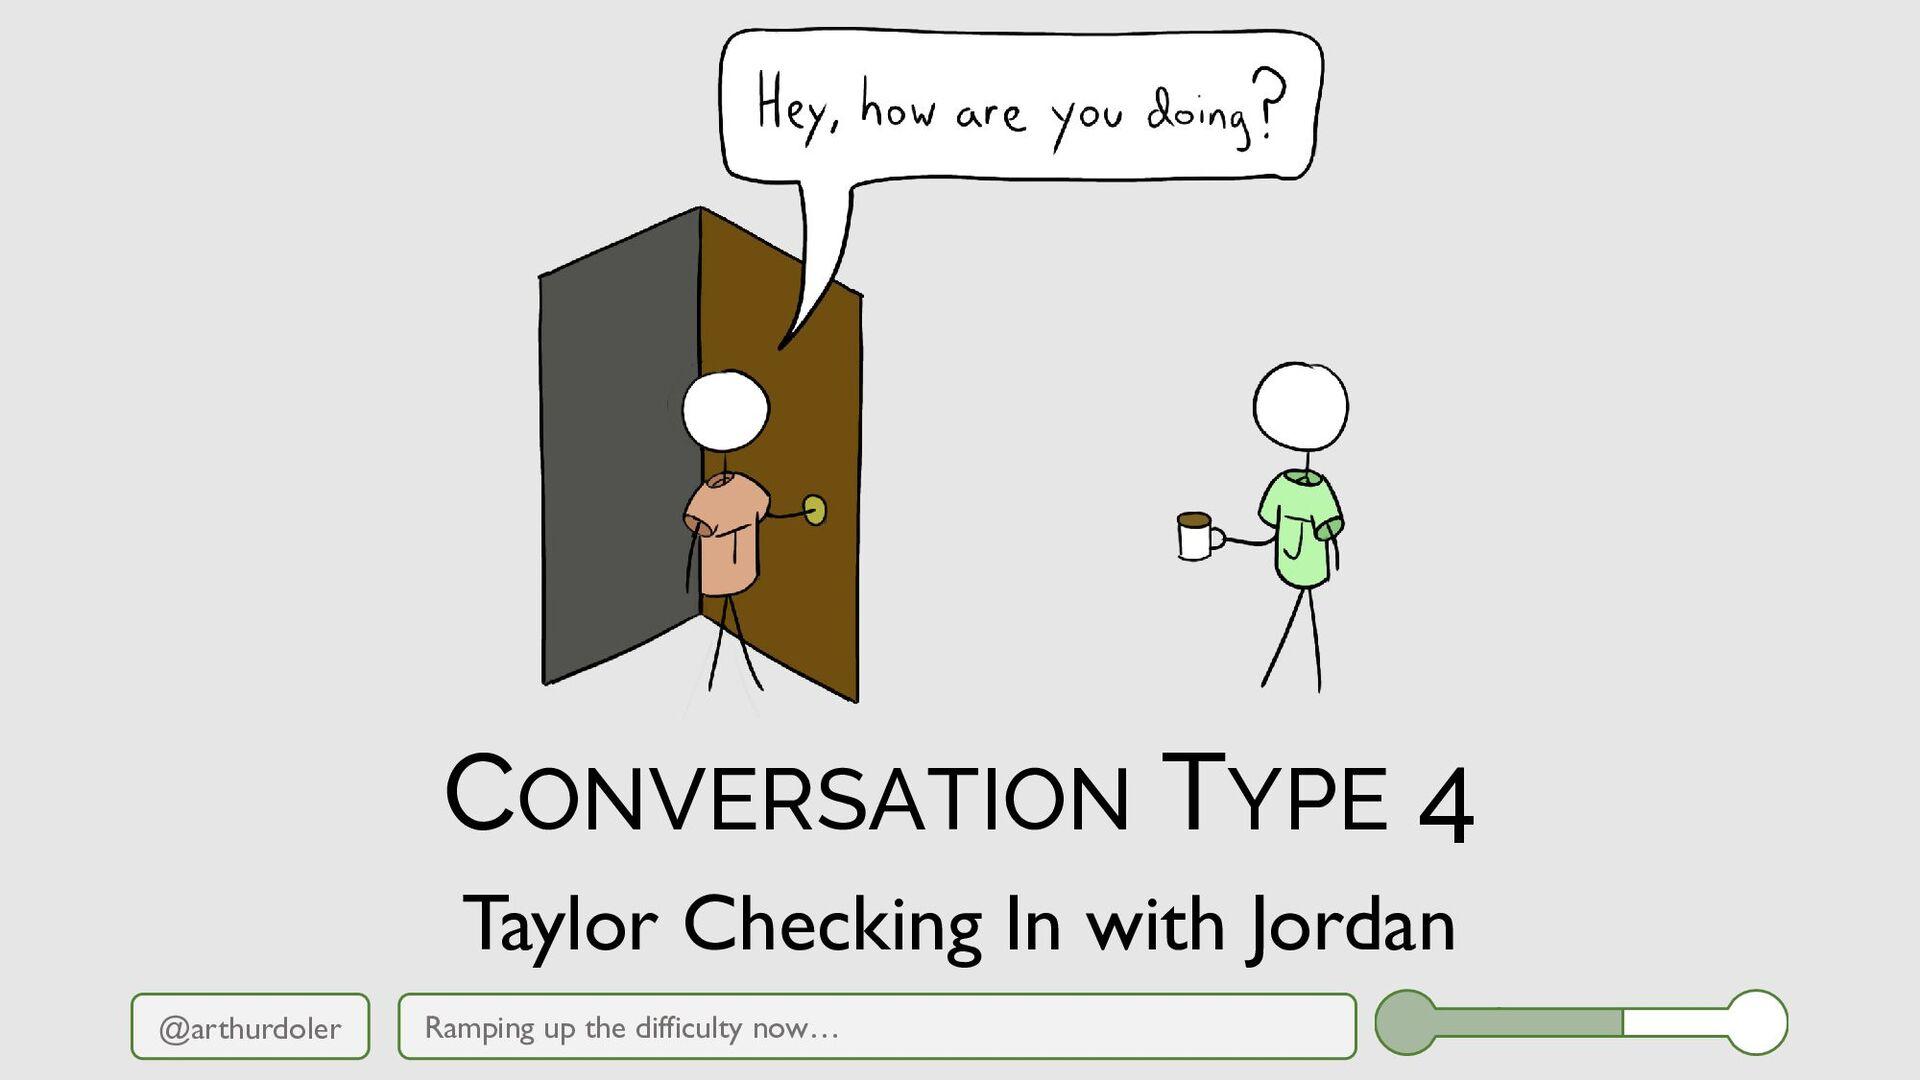 @arthurdoler CONVERSATION TYPE 4 Ramping up the...